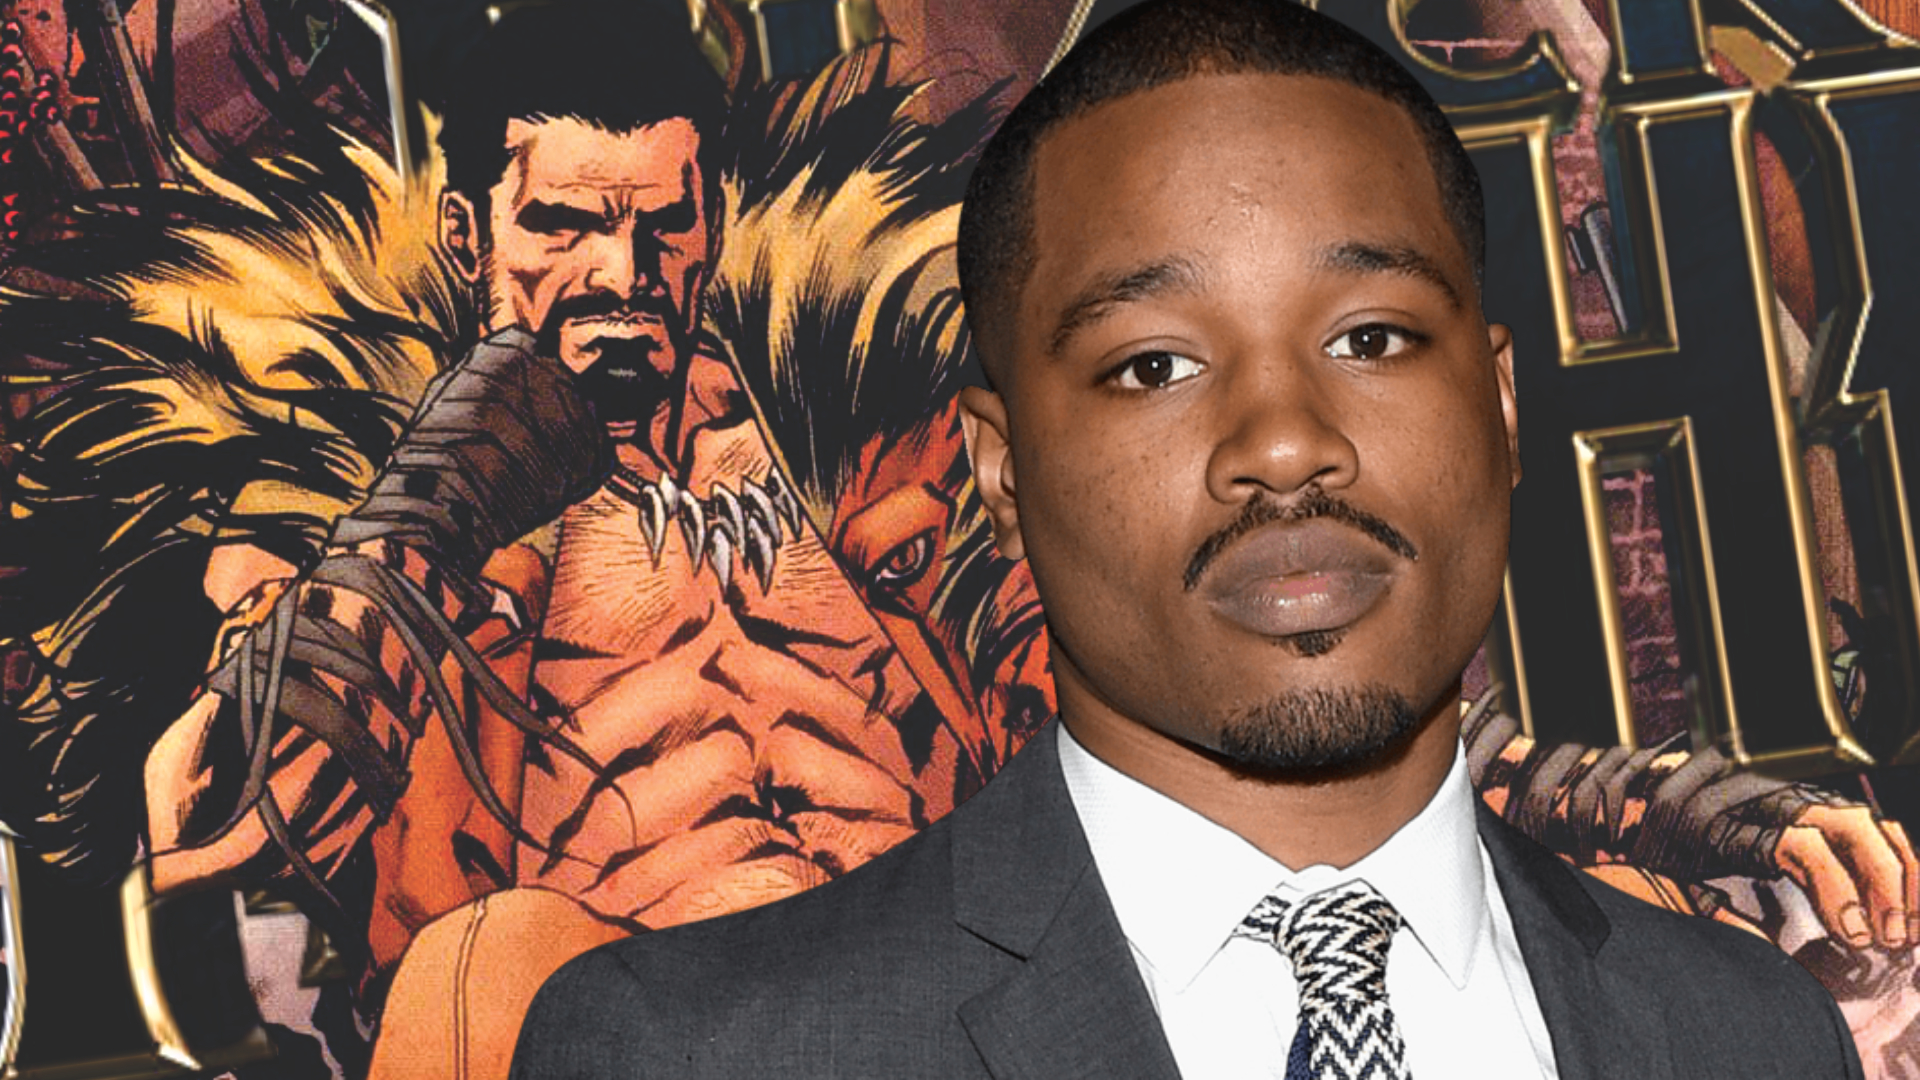 Ryan Coogler Wanted Kraven The Hunter for 'Black Panther'